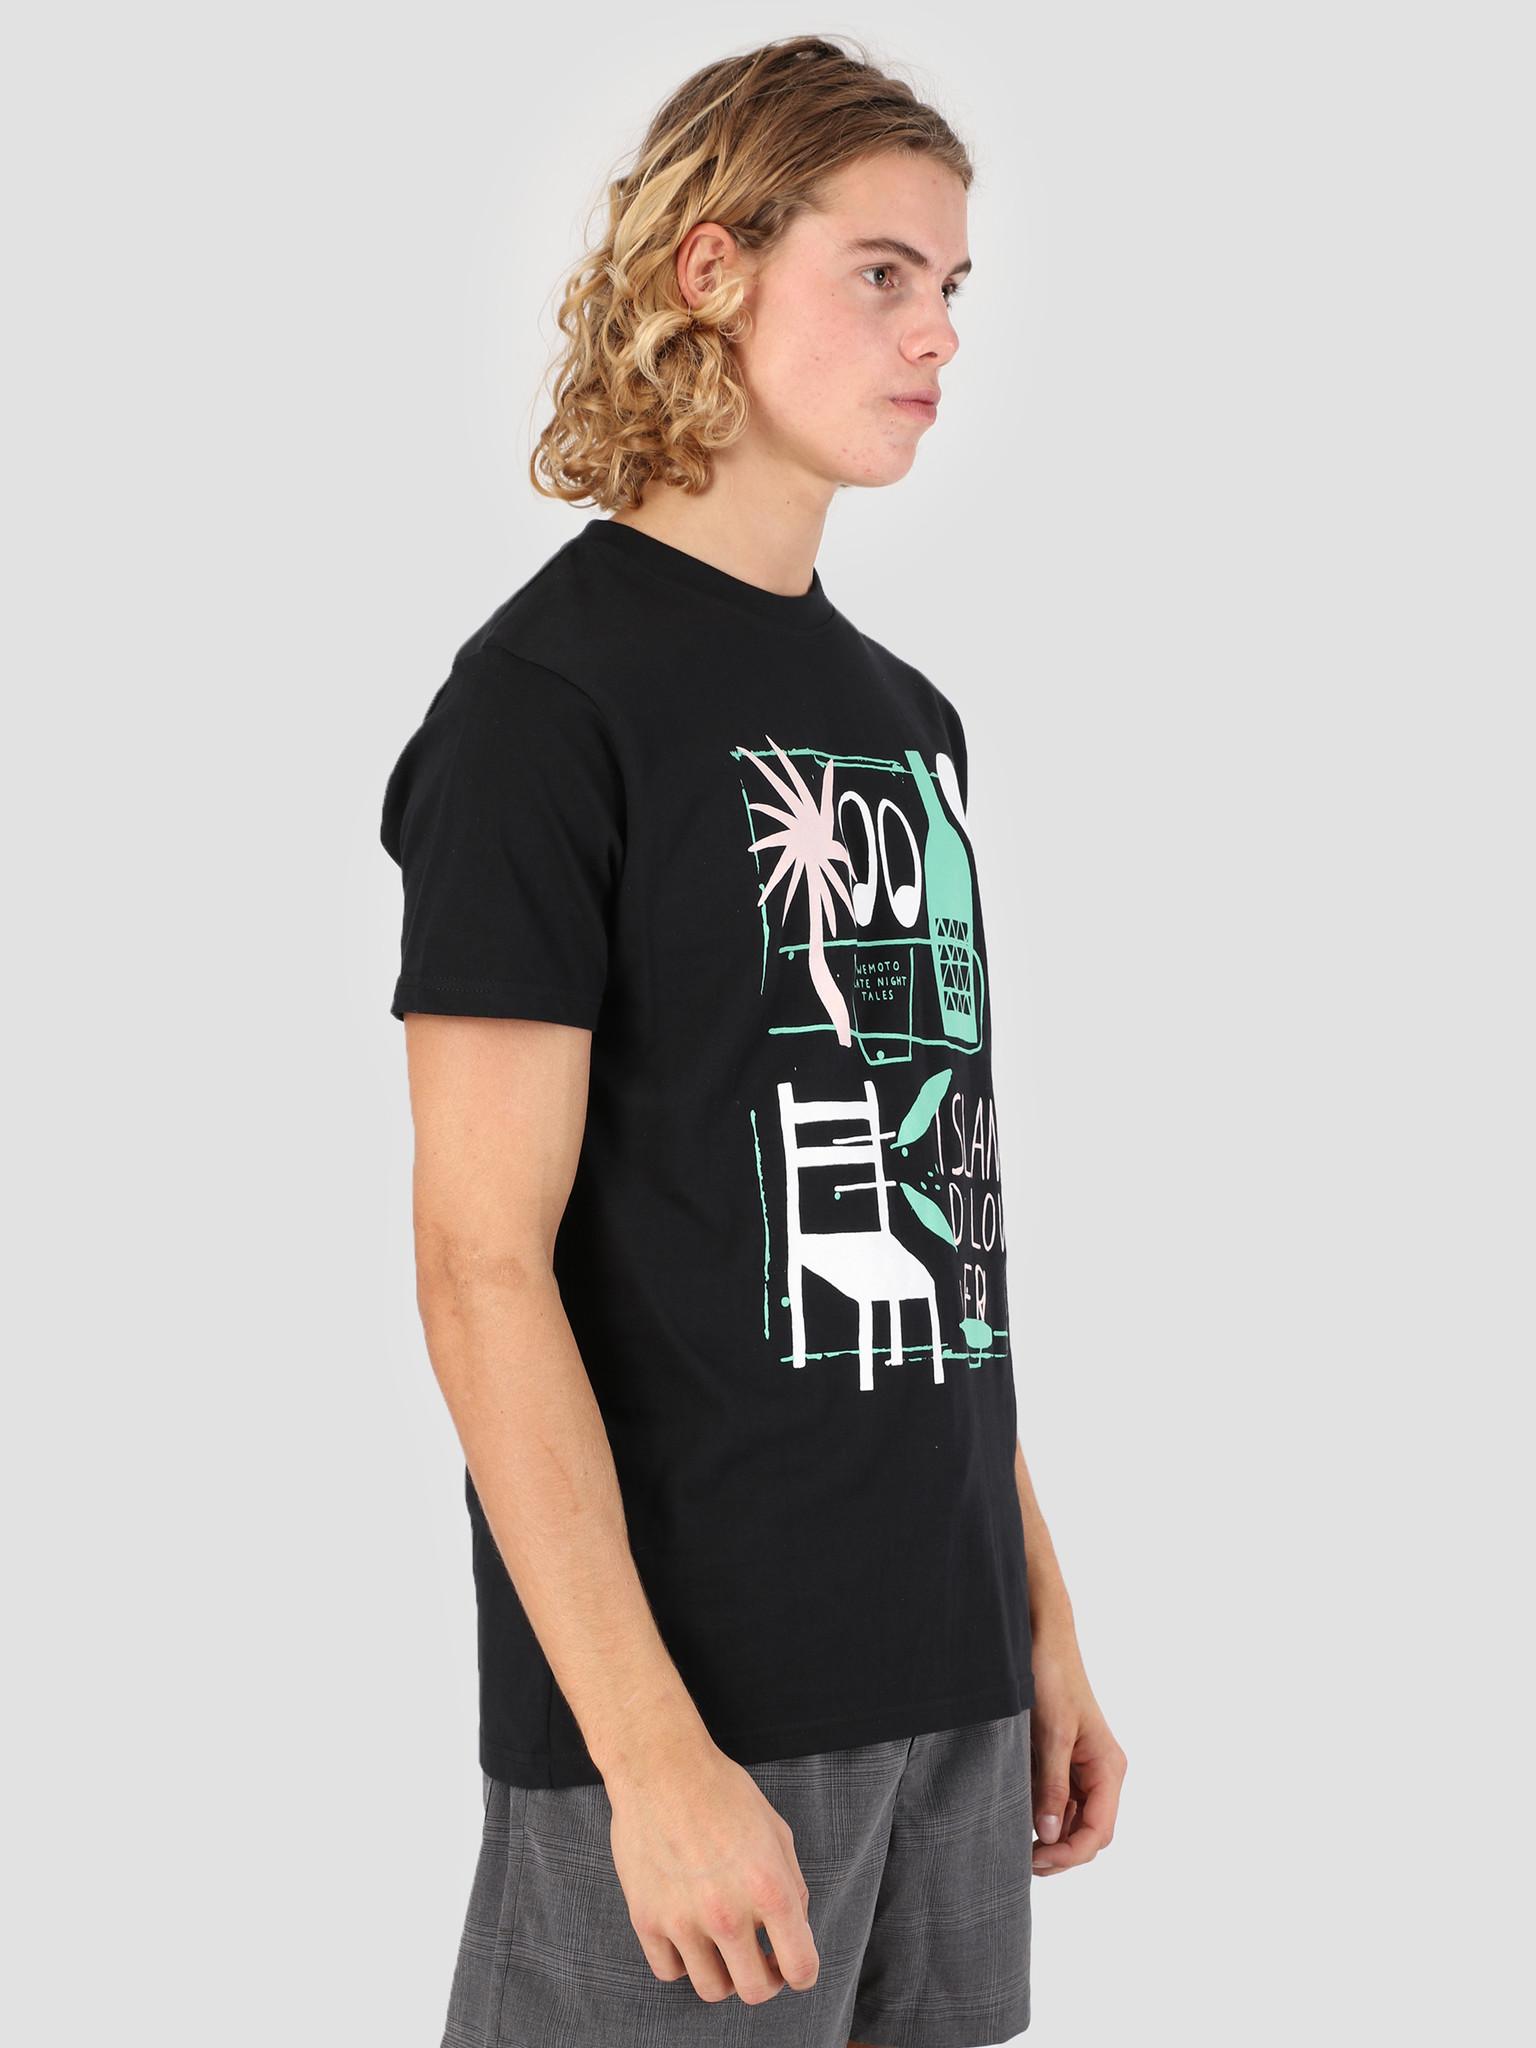 cc05a5bd9c4d Wemoto Lover T-Shirt Black 131.104-100 - FRESHCOTTON